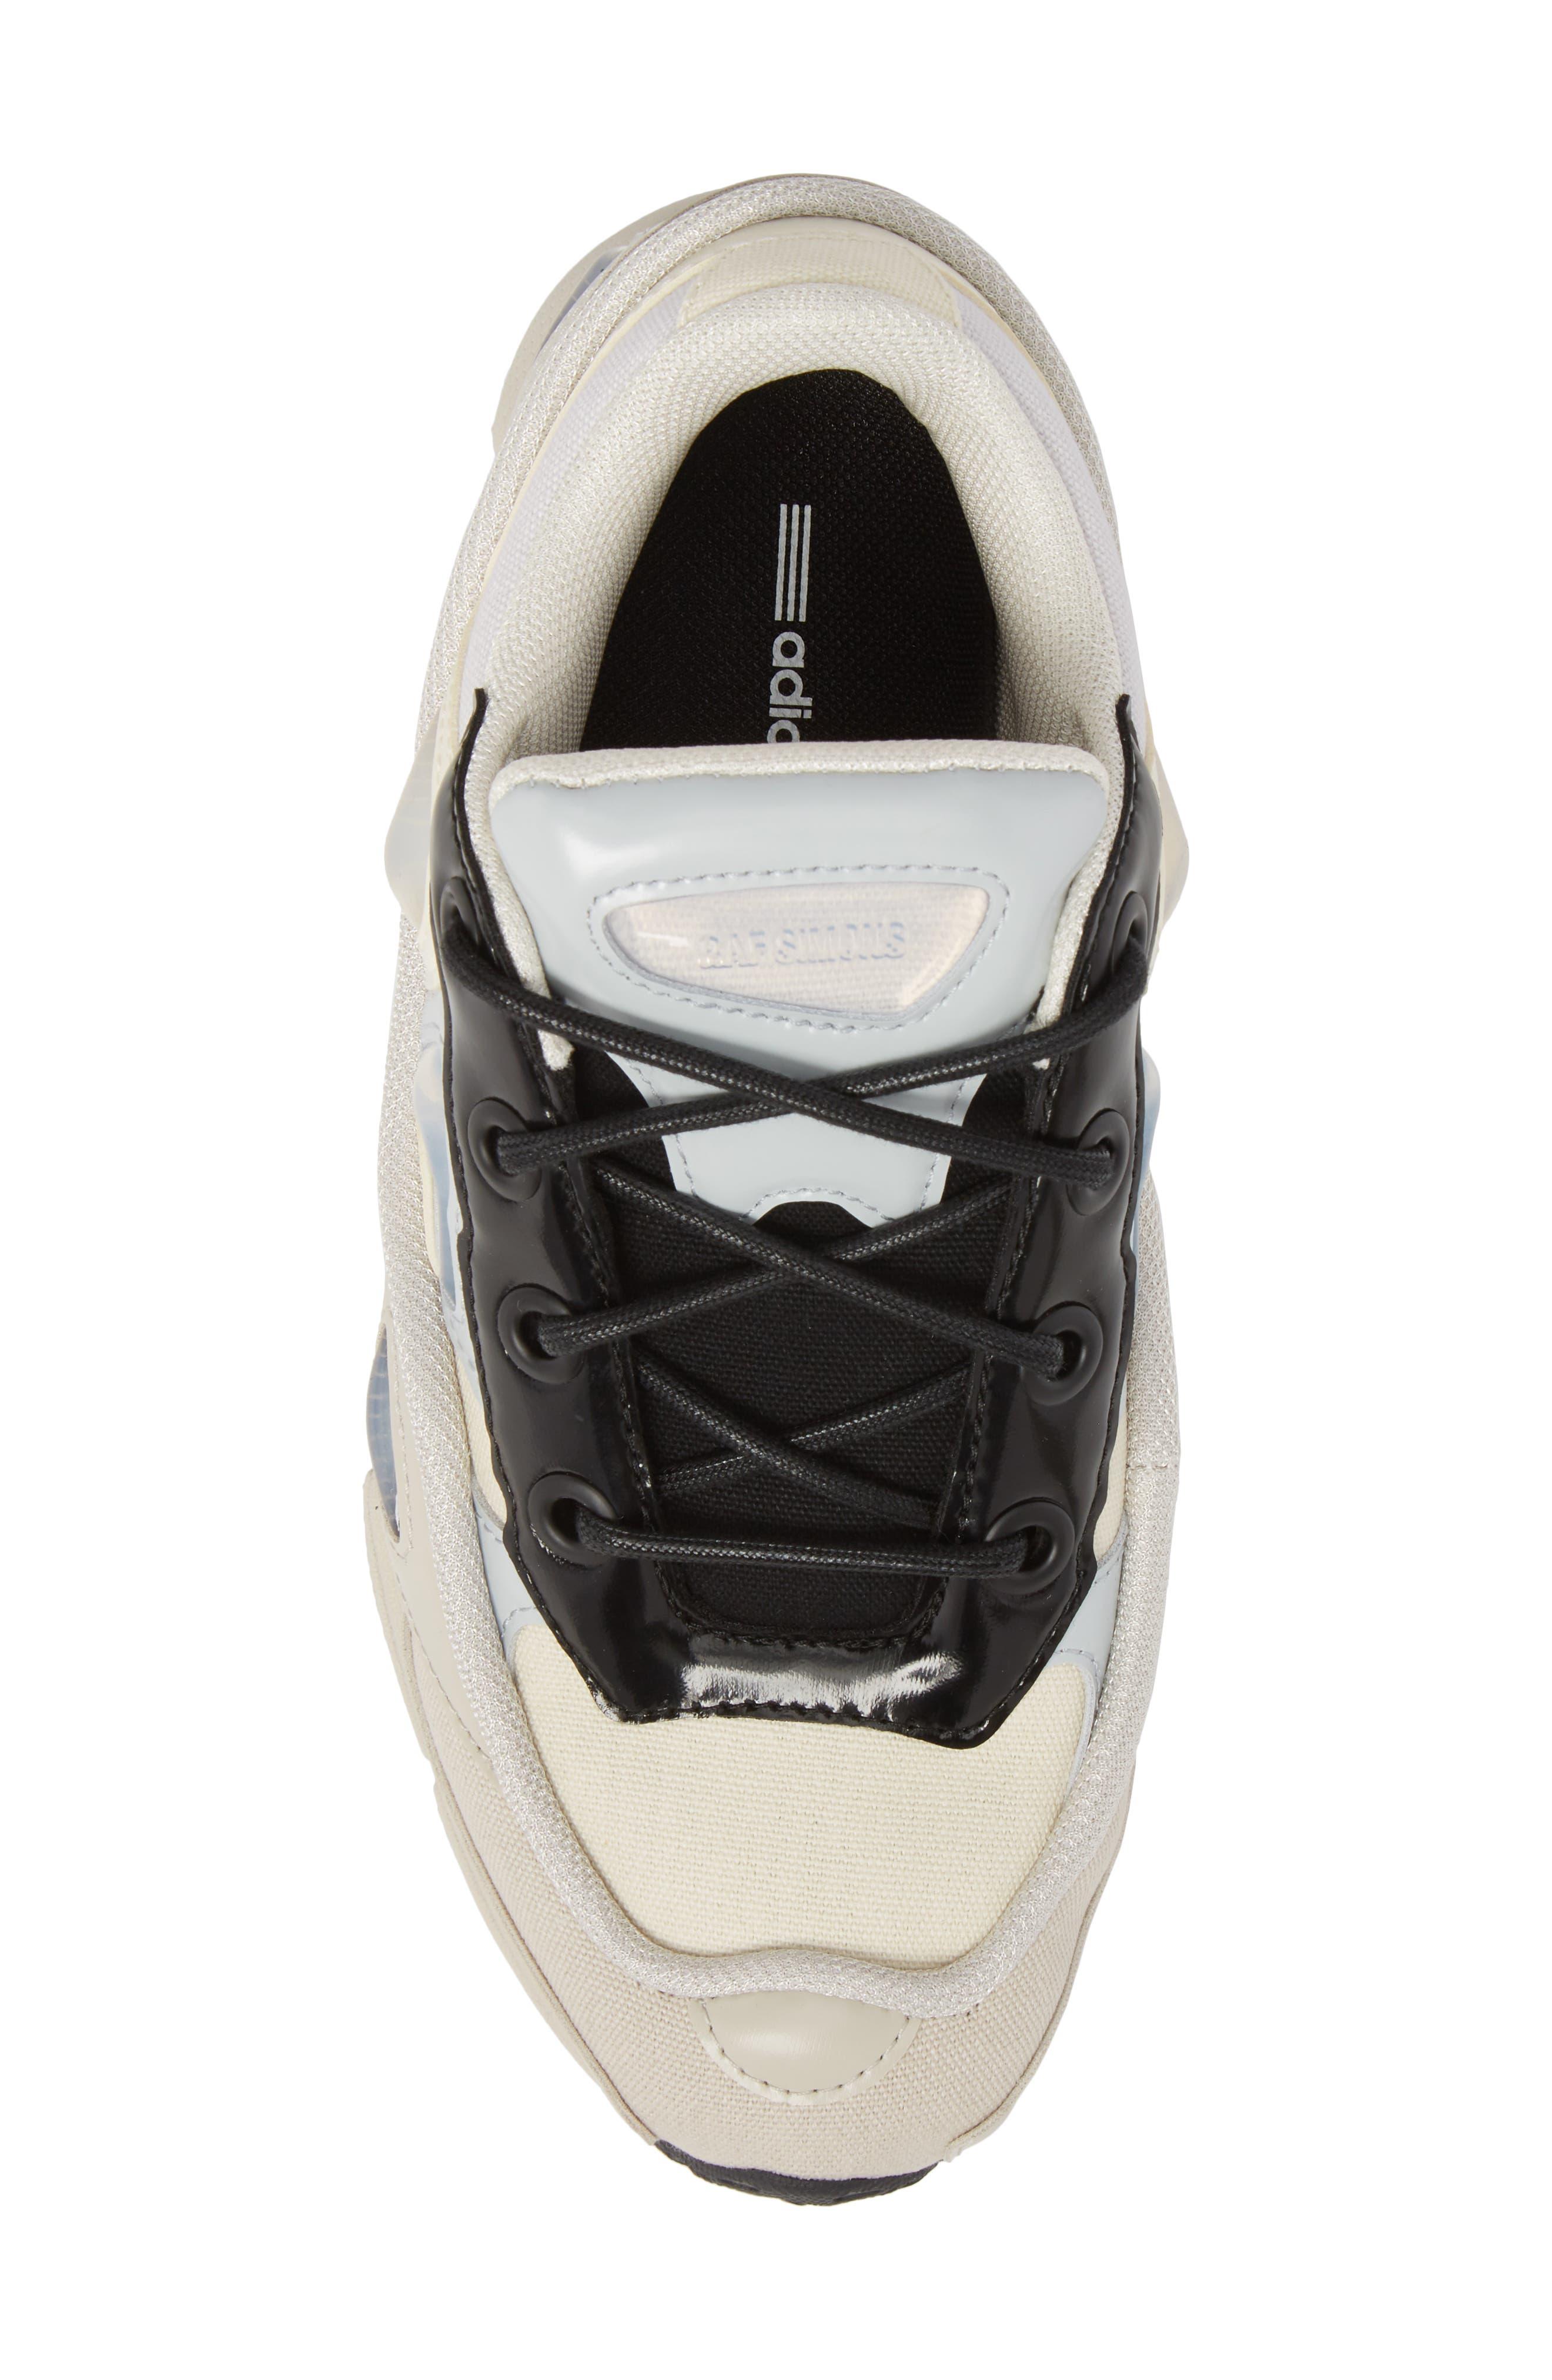 adidas by Raf Simons Ozweego III Sneaker,                             Alternate thumbnail 5, color,                             150